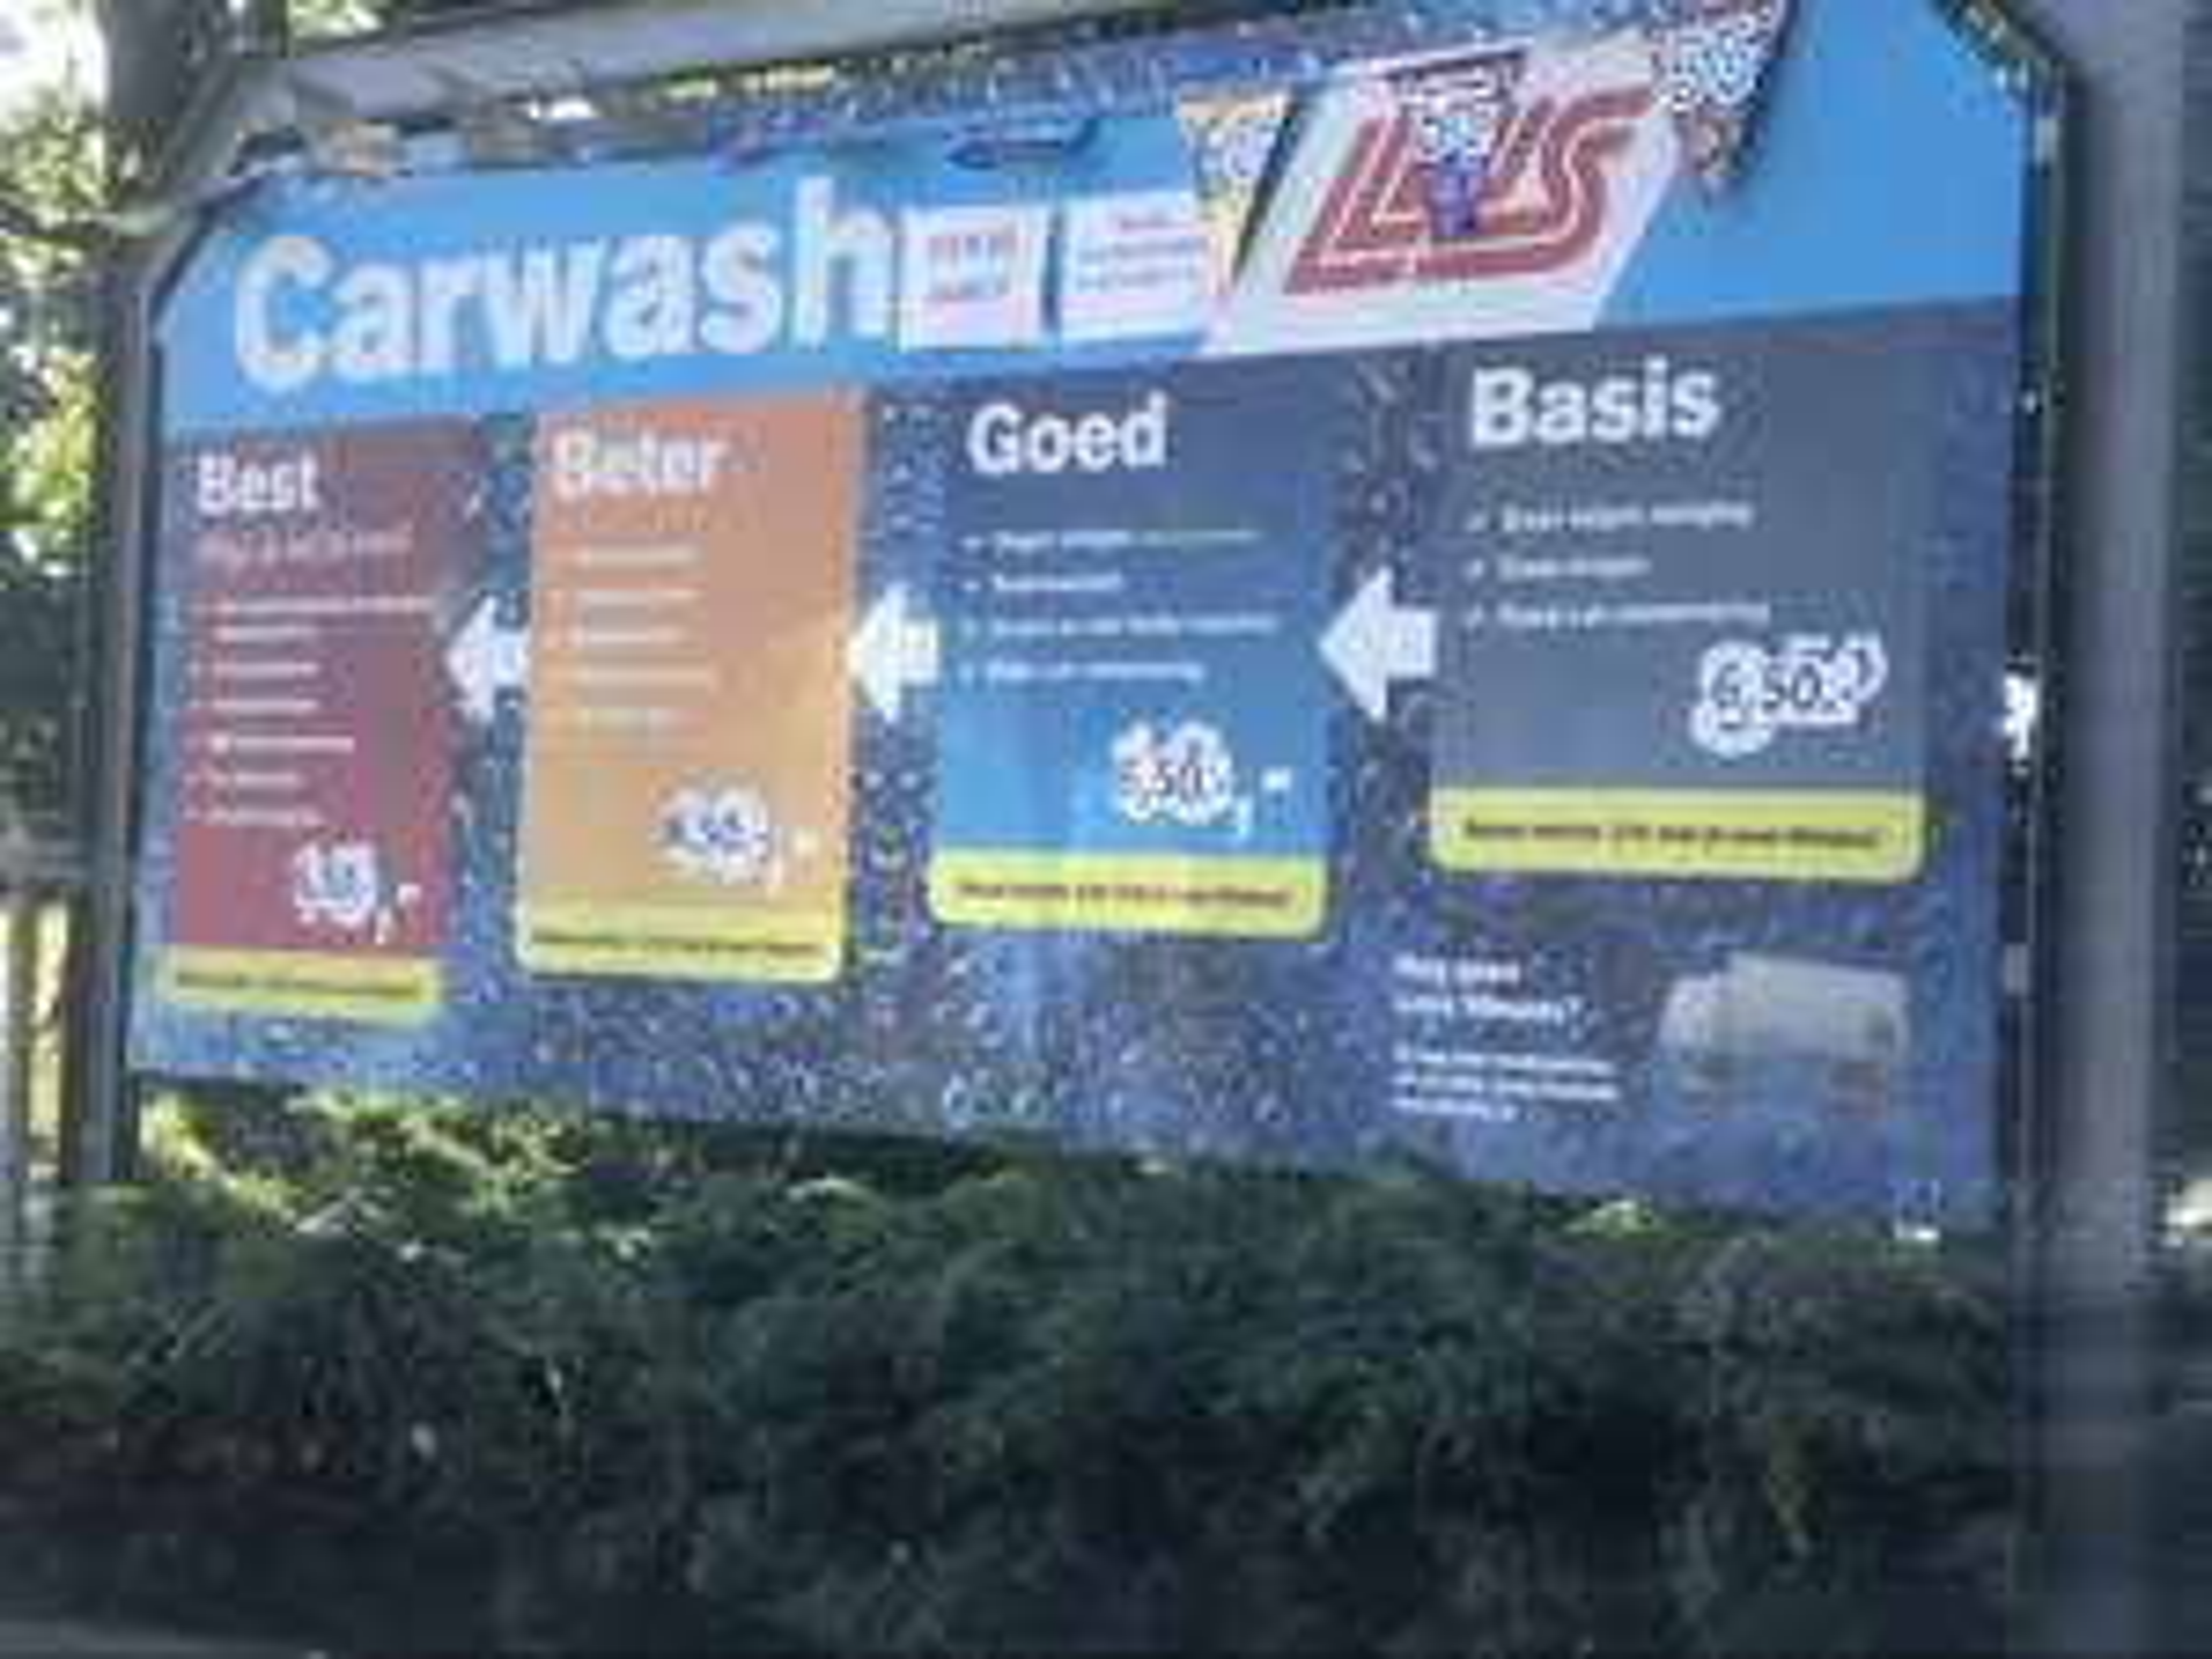 [LOKAAL ALMELO] Leus carwash (6,50)